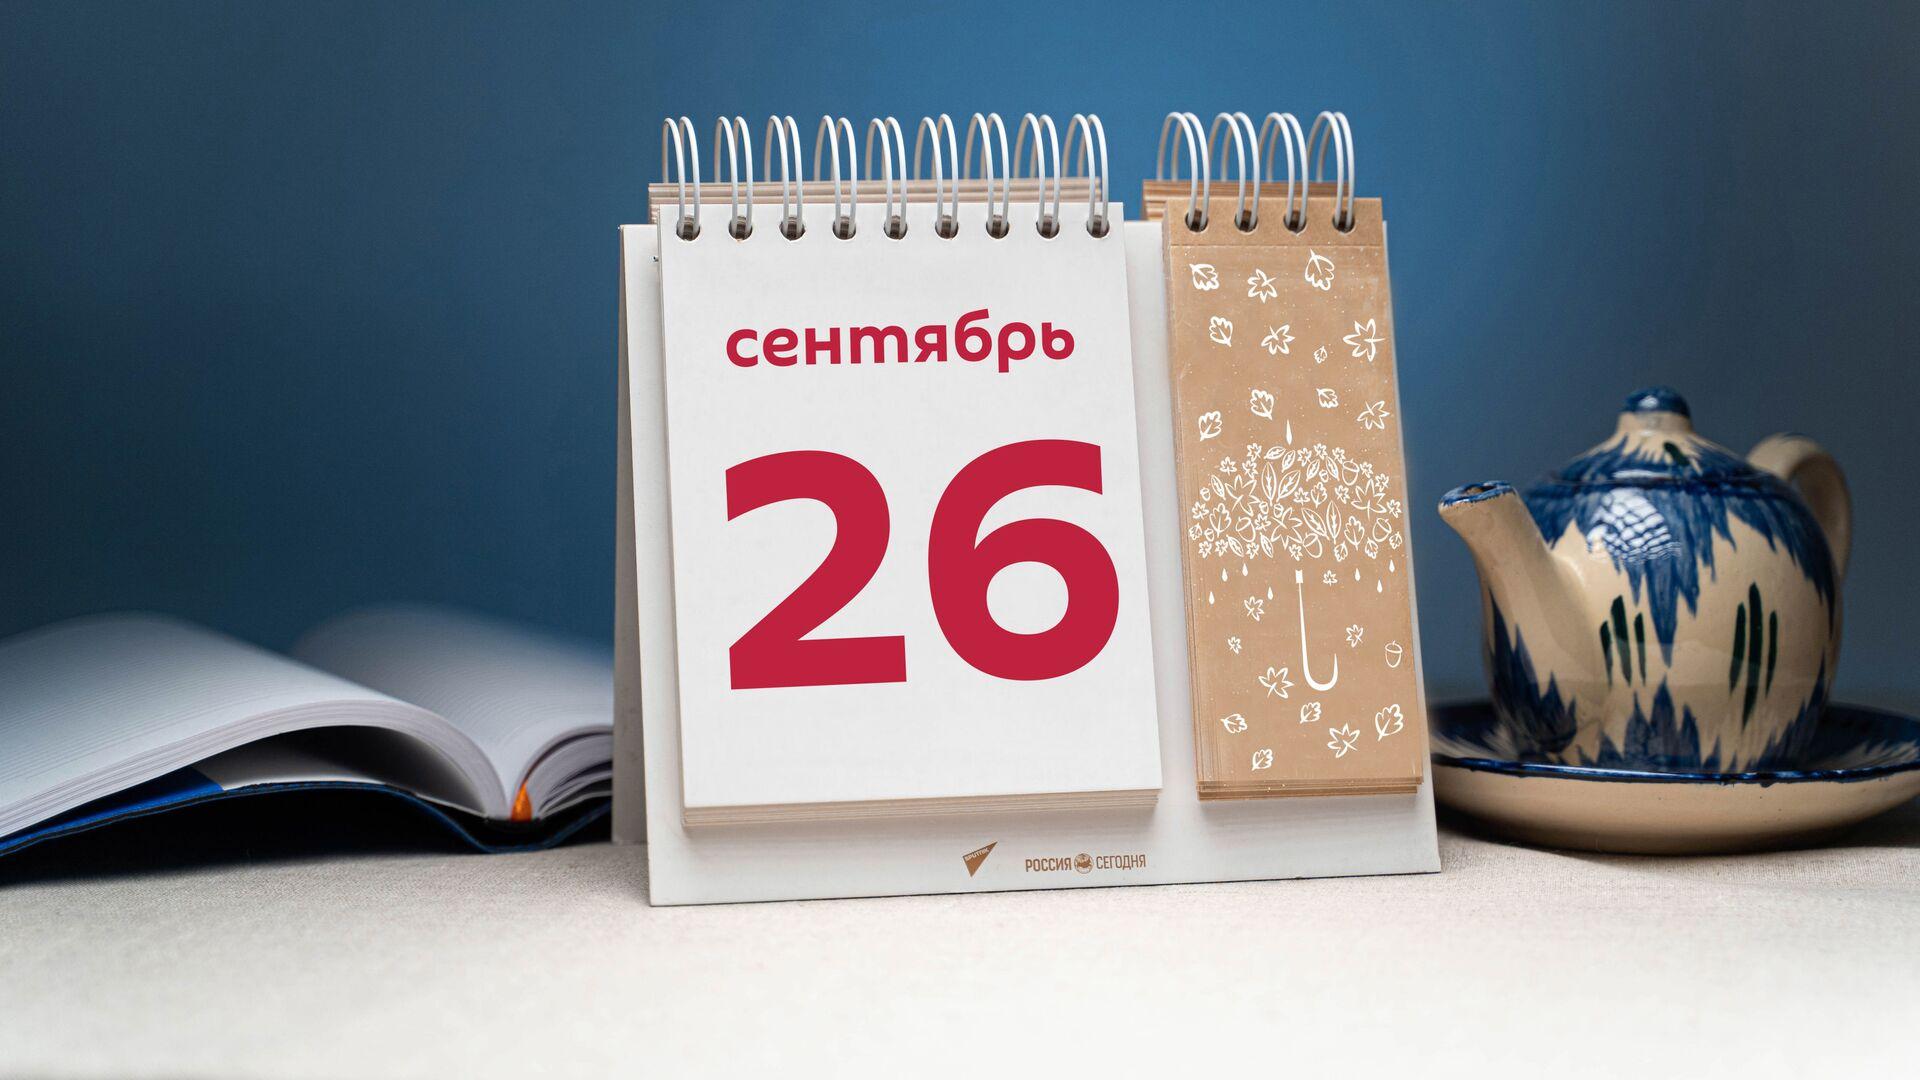 День 26 сентября - Sputnik Тоҷикистон, 1920, 26.09.2021